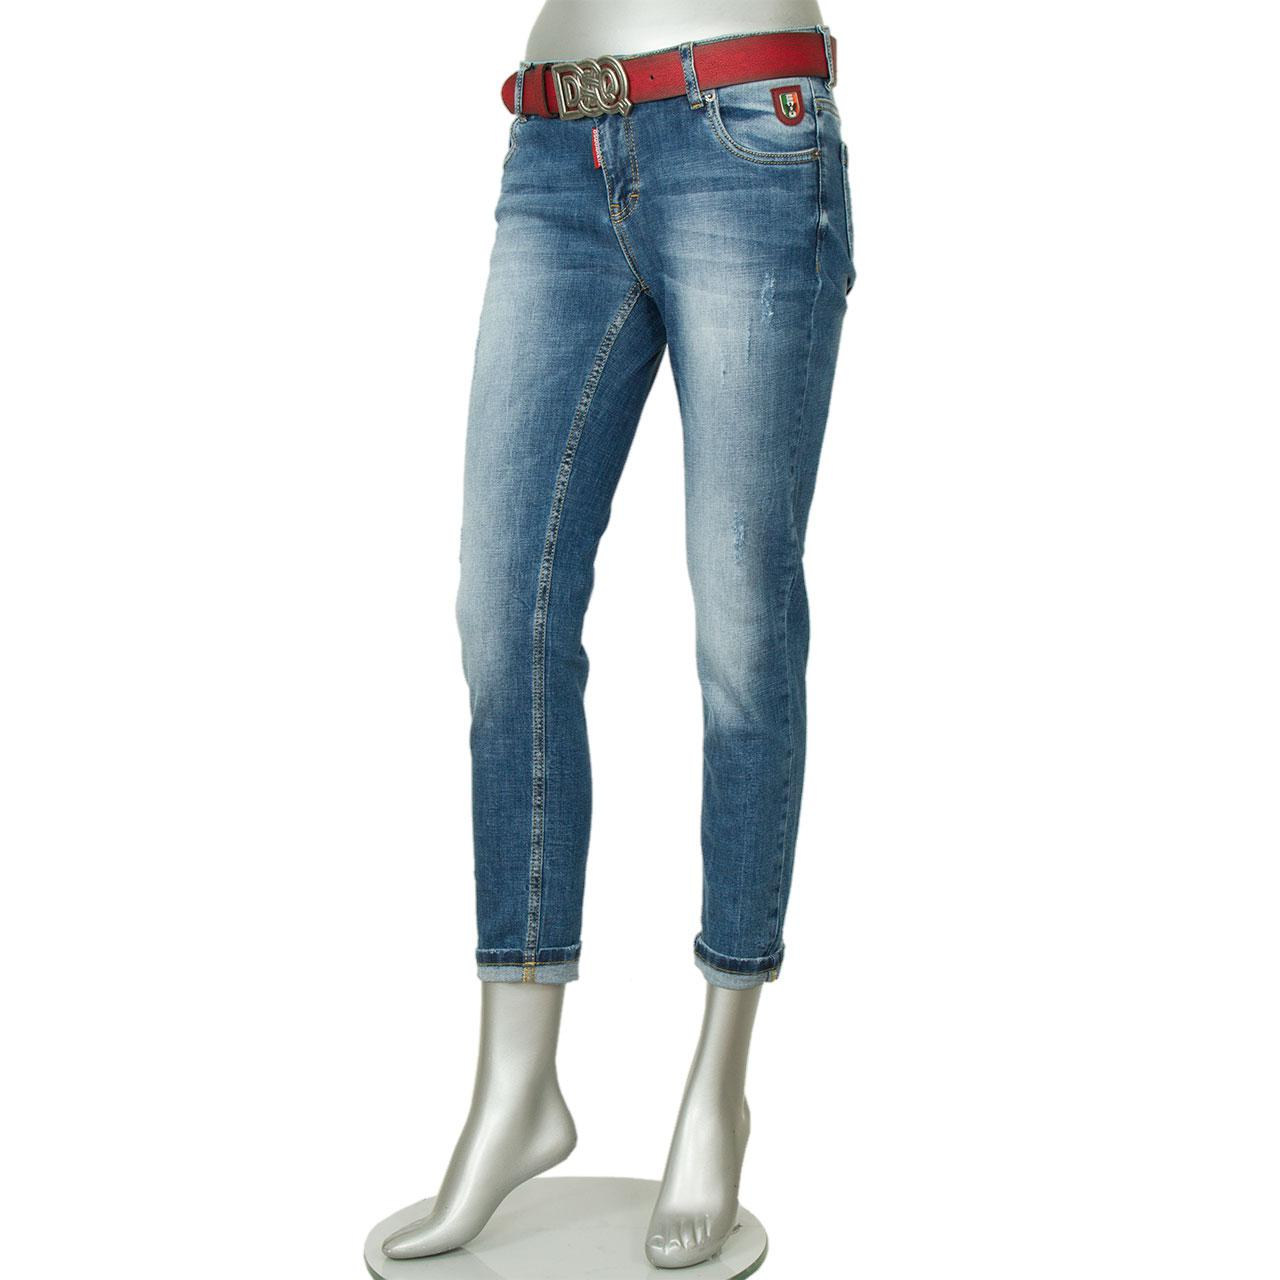 ec5d60034f72 Женские джинсы-бойфренд DSQUARED2 - ваш online гардероб в Кременчуге